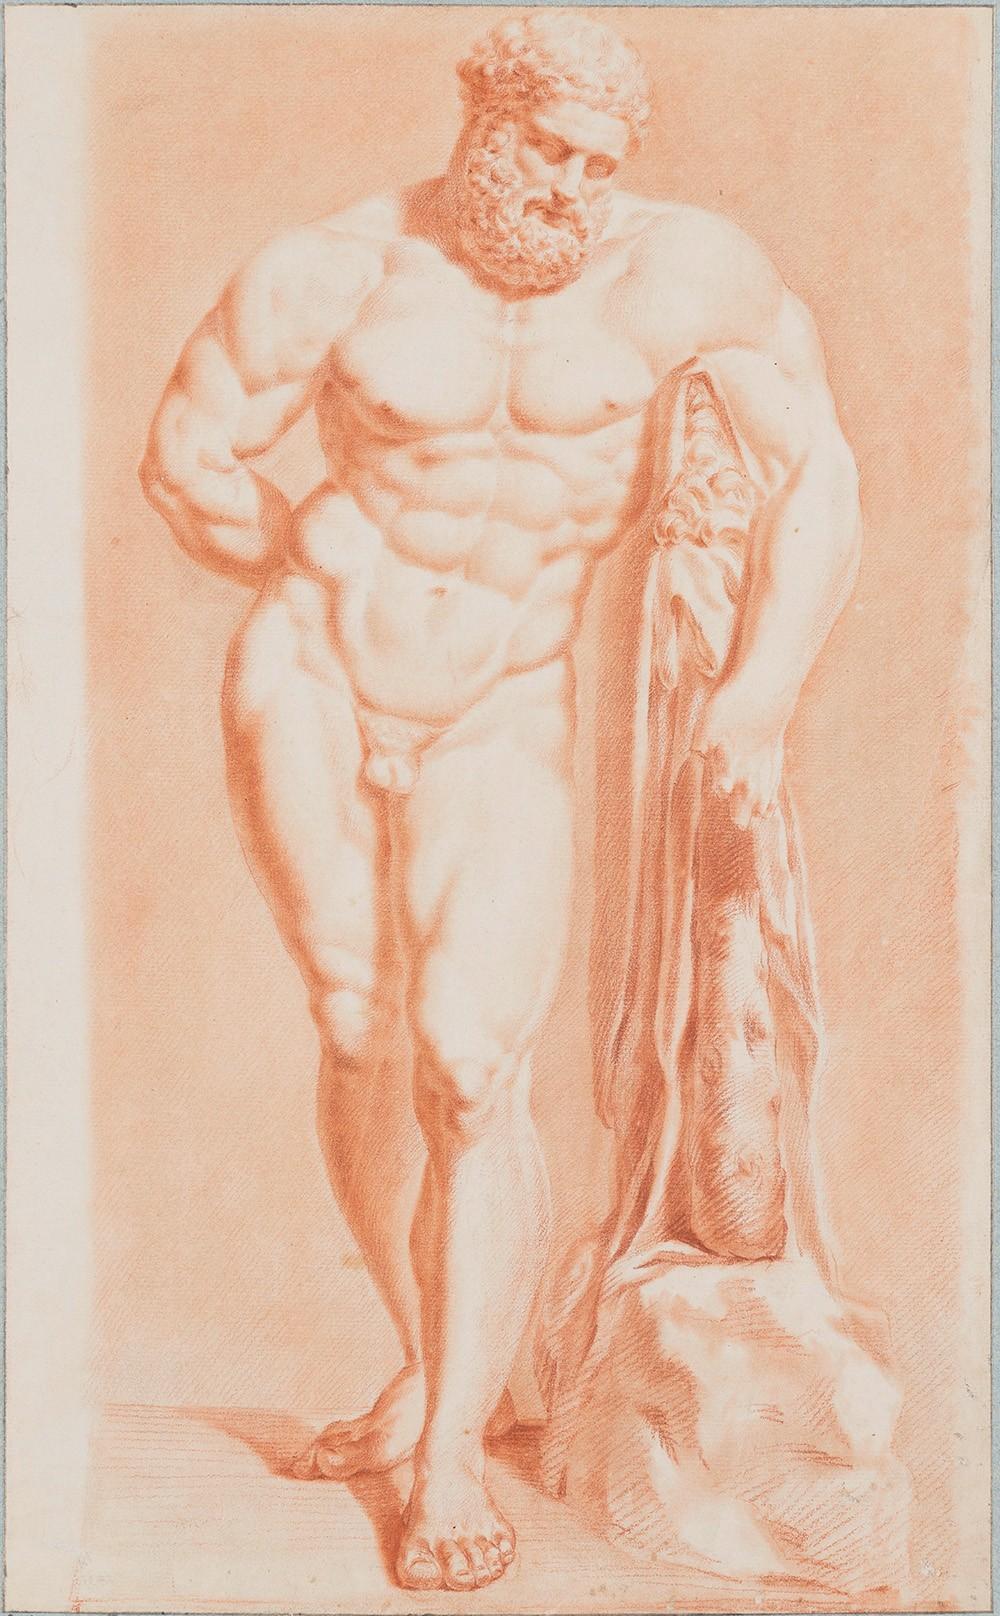 Johann Georg Schütz, Herkules Farnese, 1778 (C) HMF, Horst Ziegenfusz